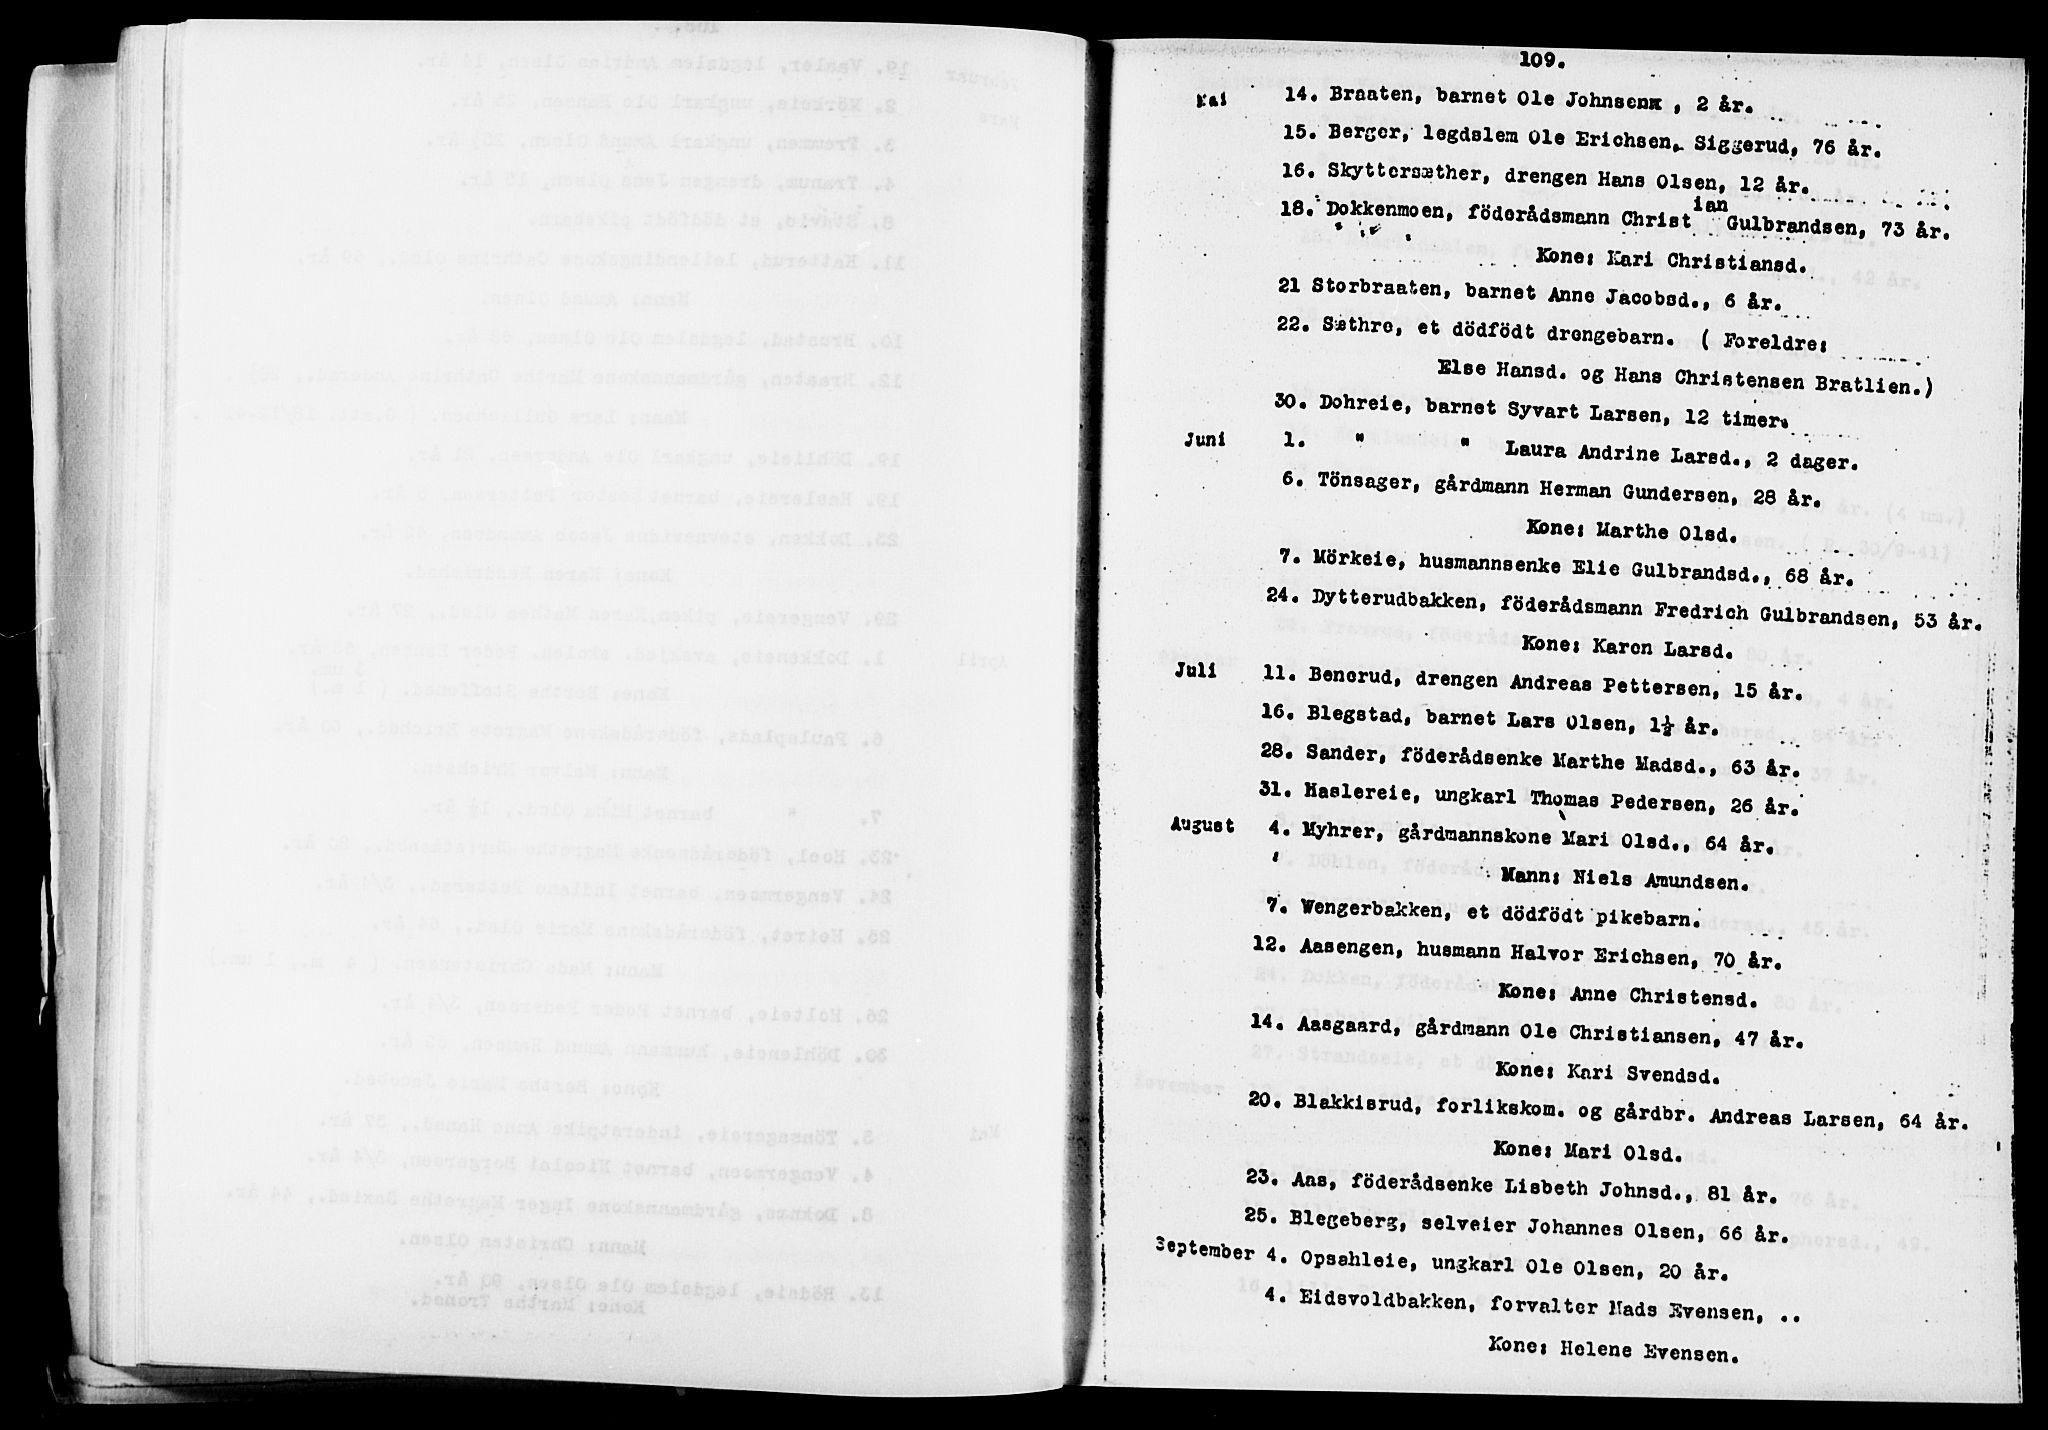 SAO, Eidsvoll prestekontor Kirkebøker, O/Oa/L0005: Annen kirkebok nr. 5, 1815-1865, s. 109